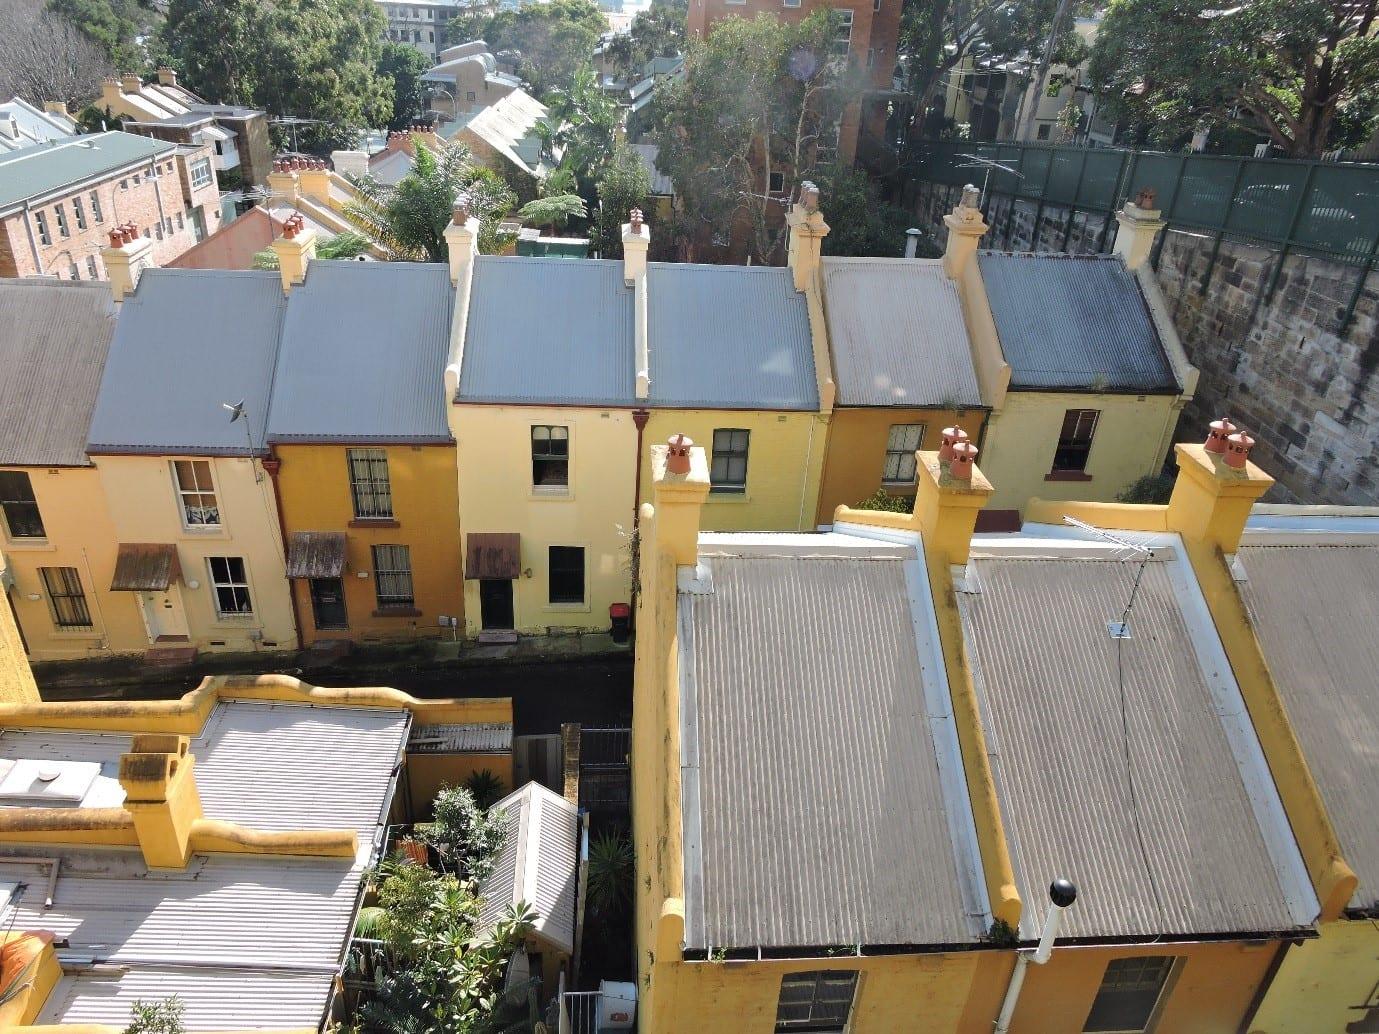 Fig.1 - Heritage houses in Woolloomooloo, NSW - Australia